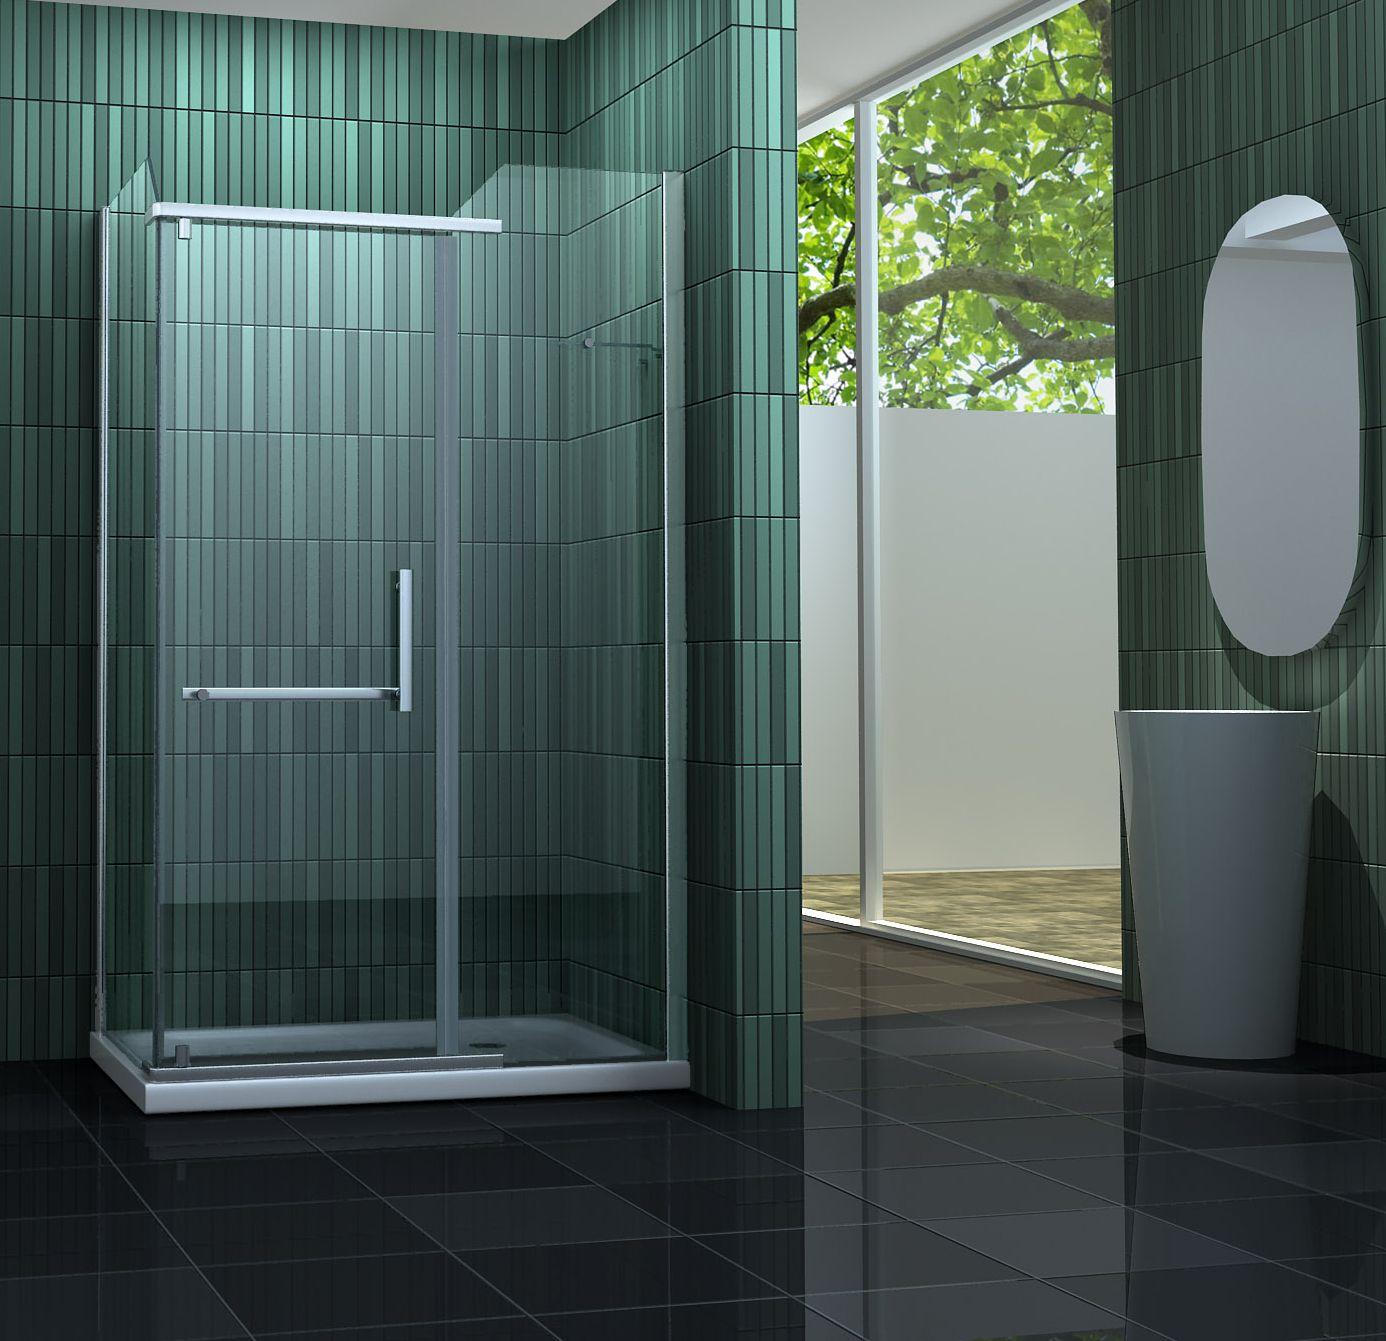 Duschkabine ENCO 100 x 80 cm ohne Duschtasse